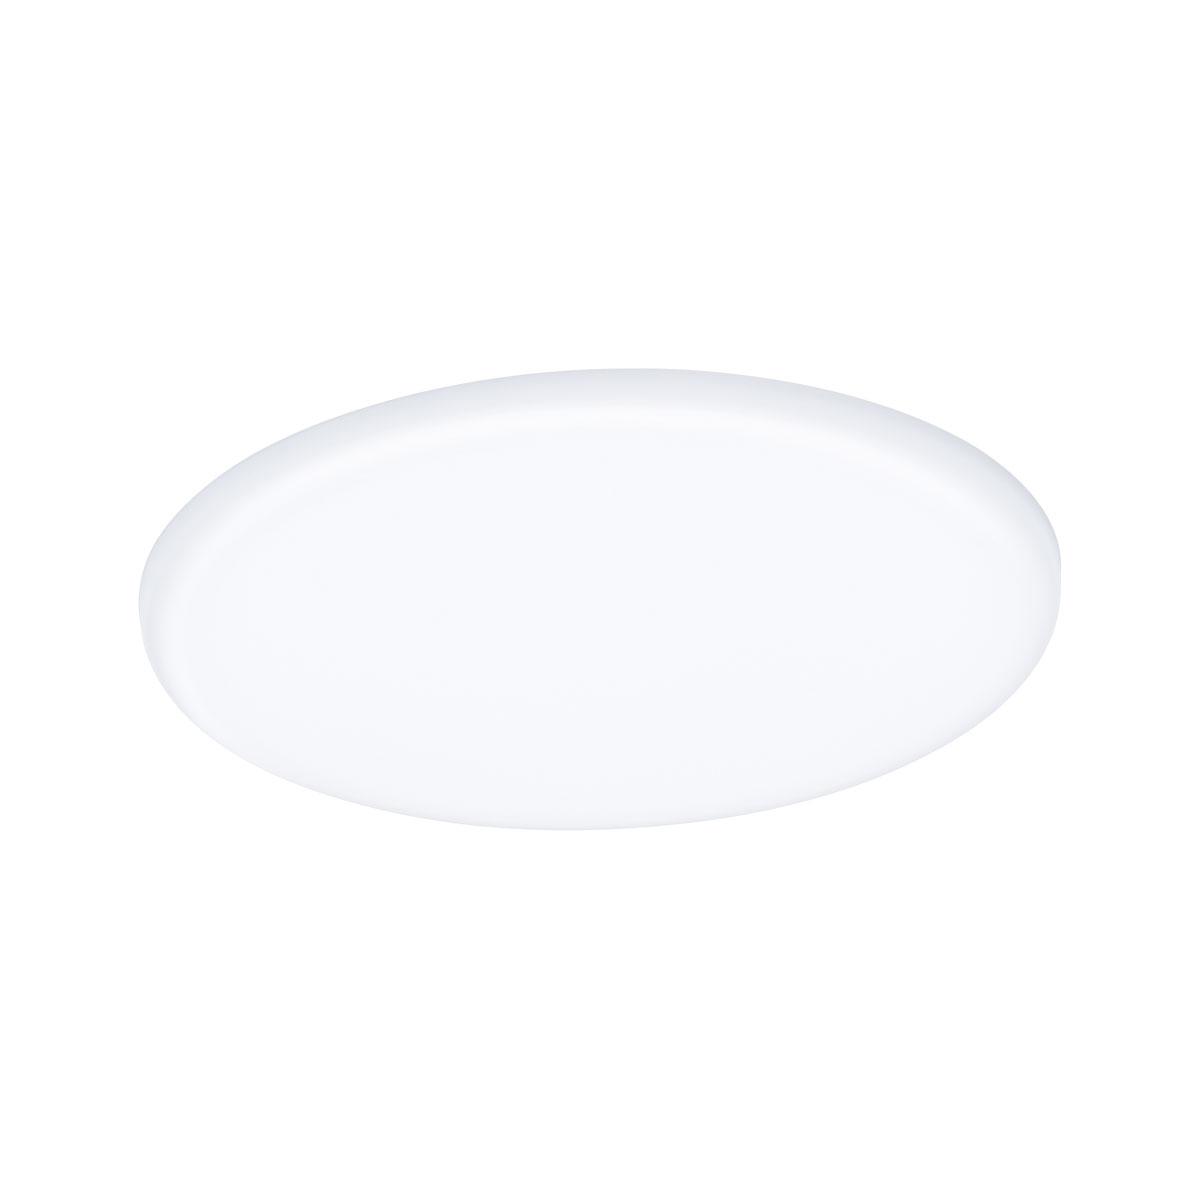 "LED-Deckenleuchte ""Veluna VariFit"", Ø18,5cm, 4000K, weiß 4000 k | 18,5 cm"